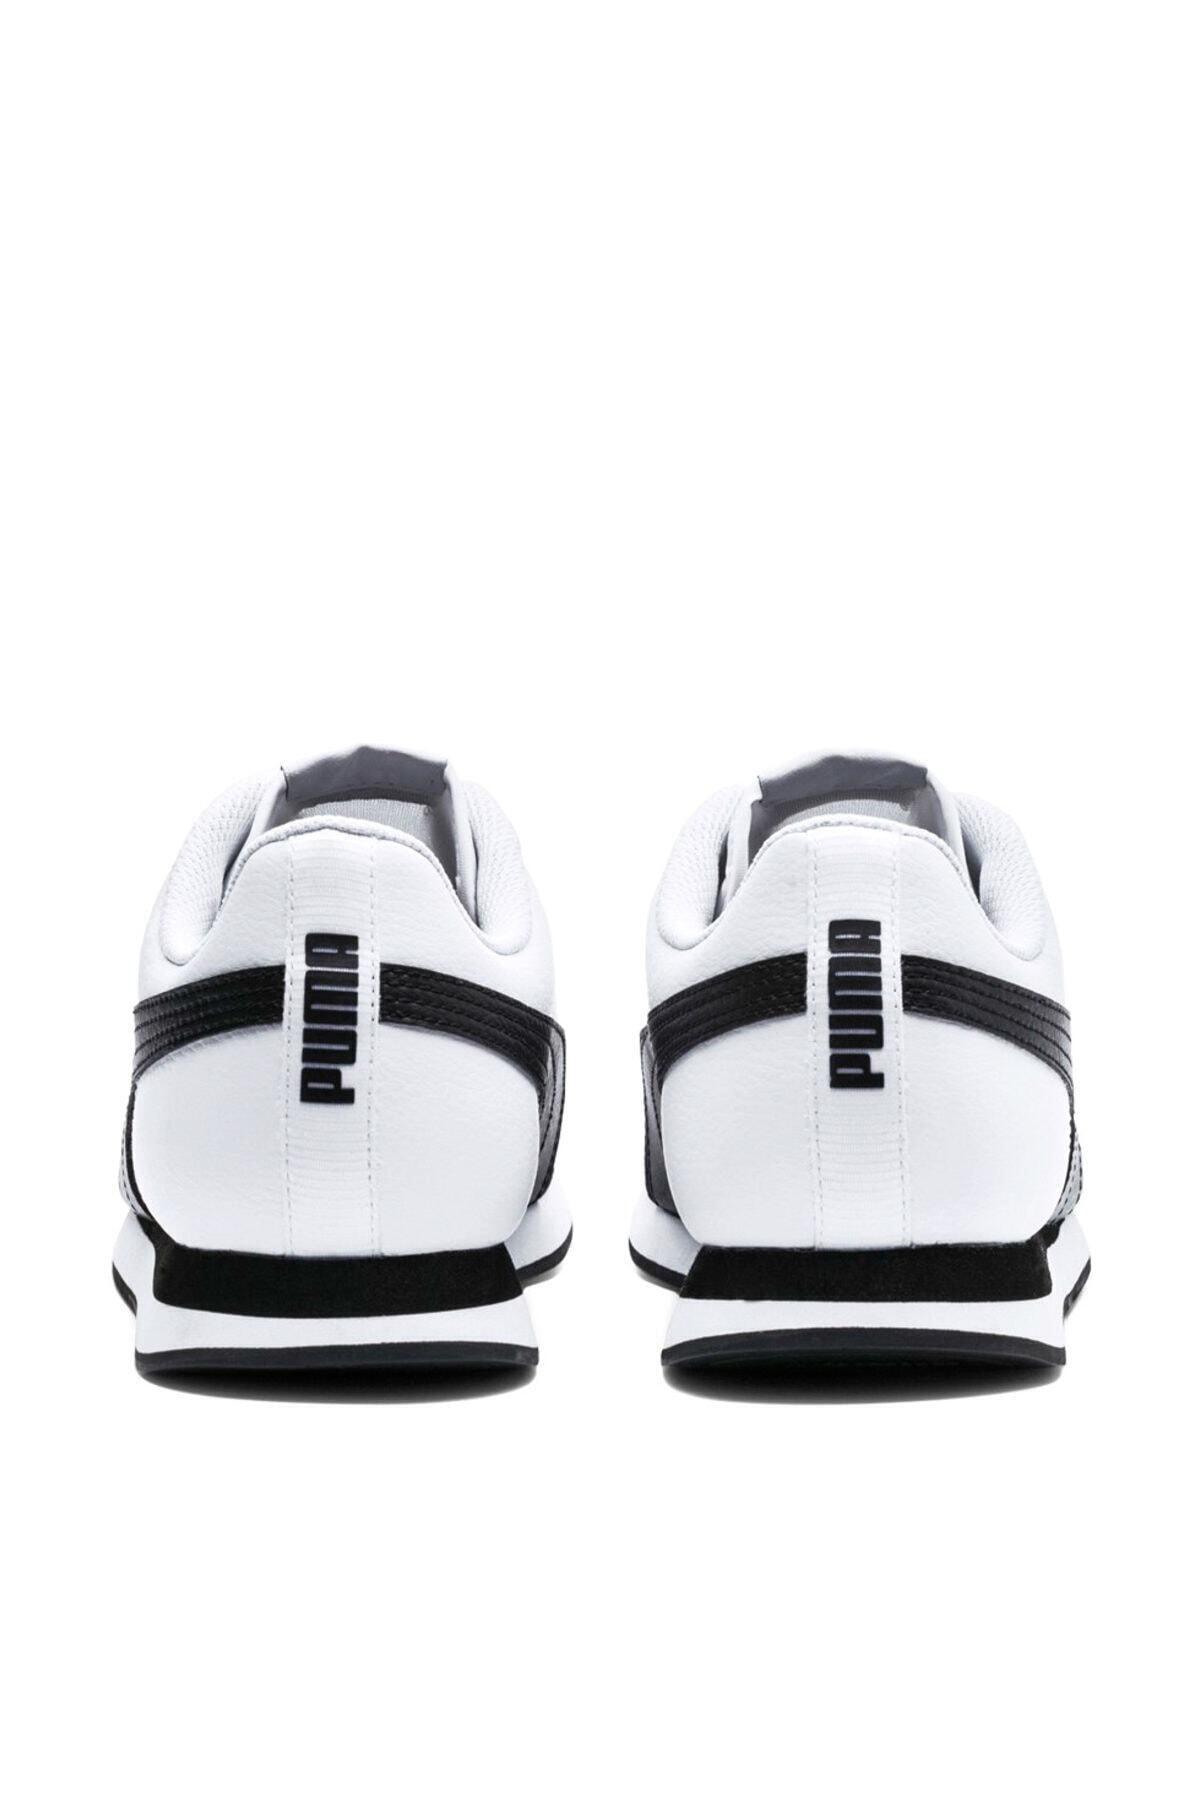 Puma Turin Ii Beyaz Siyah Erkek Sneaker Ayakkabı 100352194 2